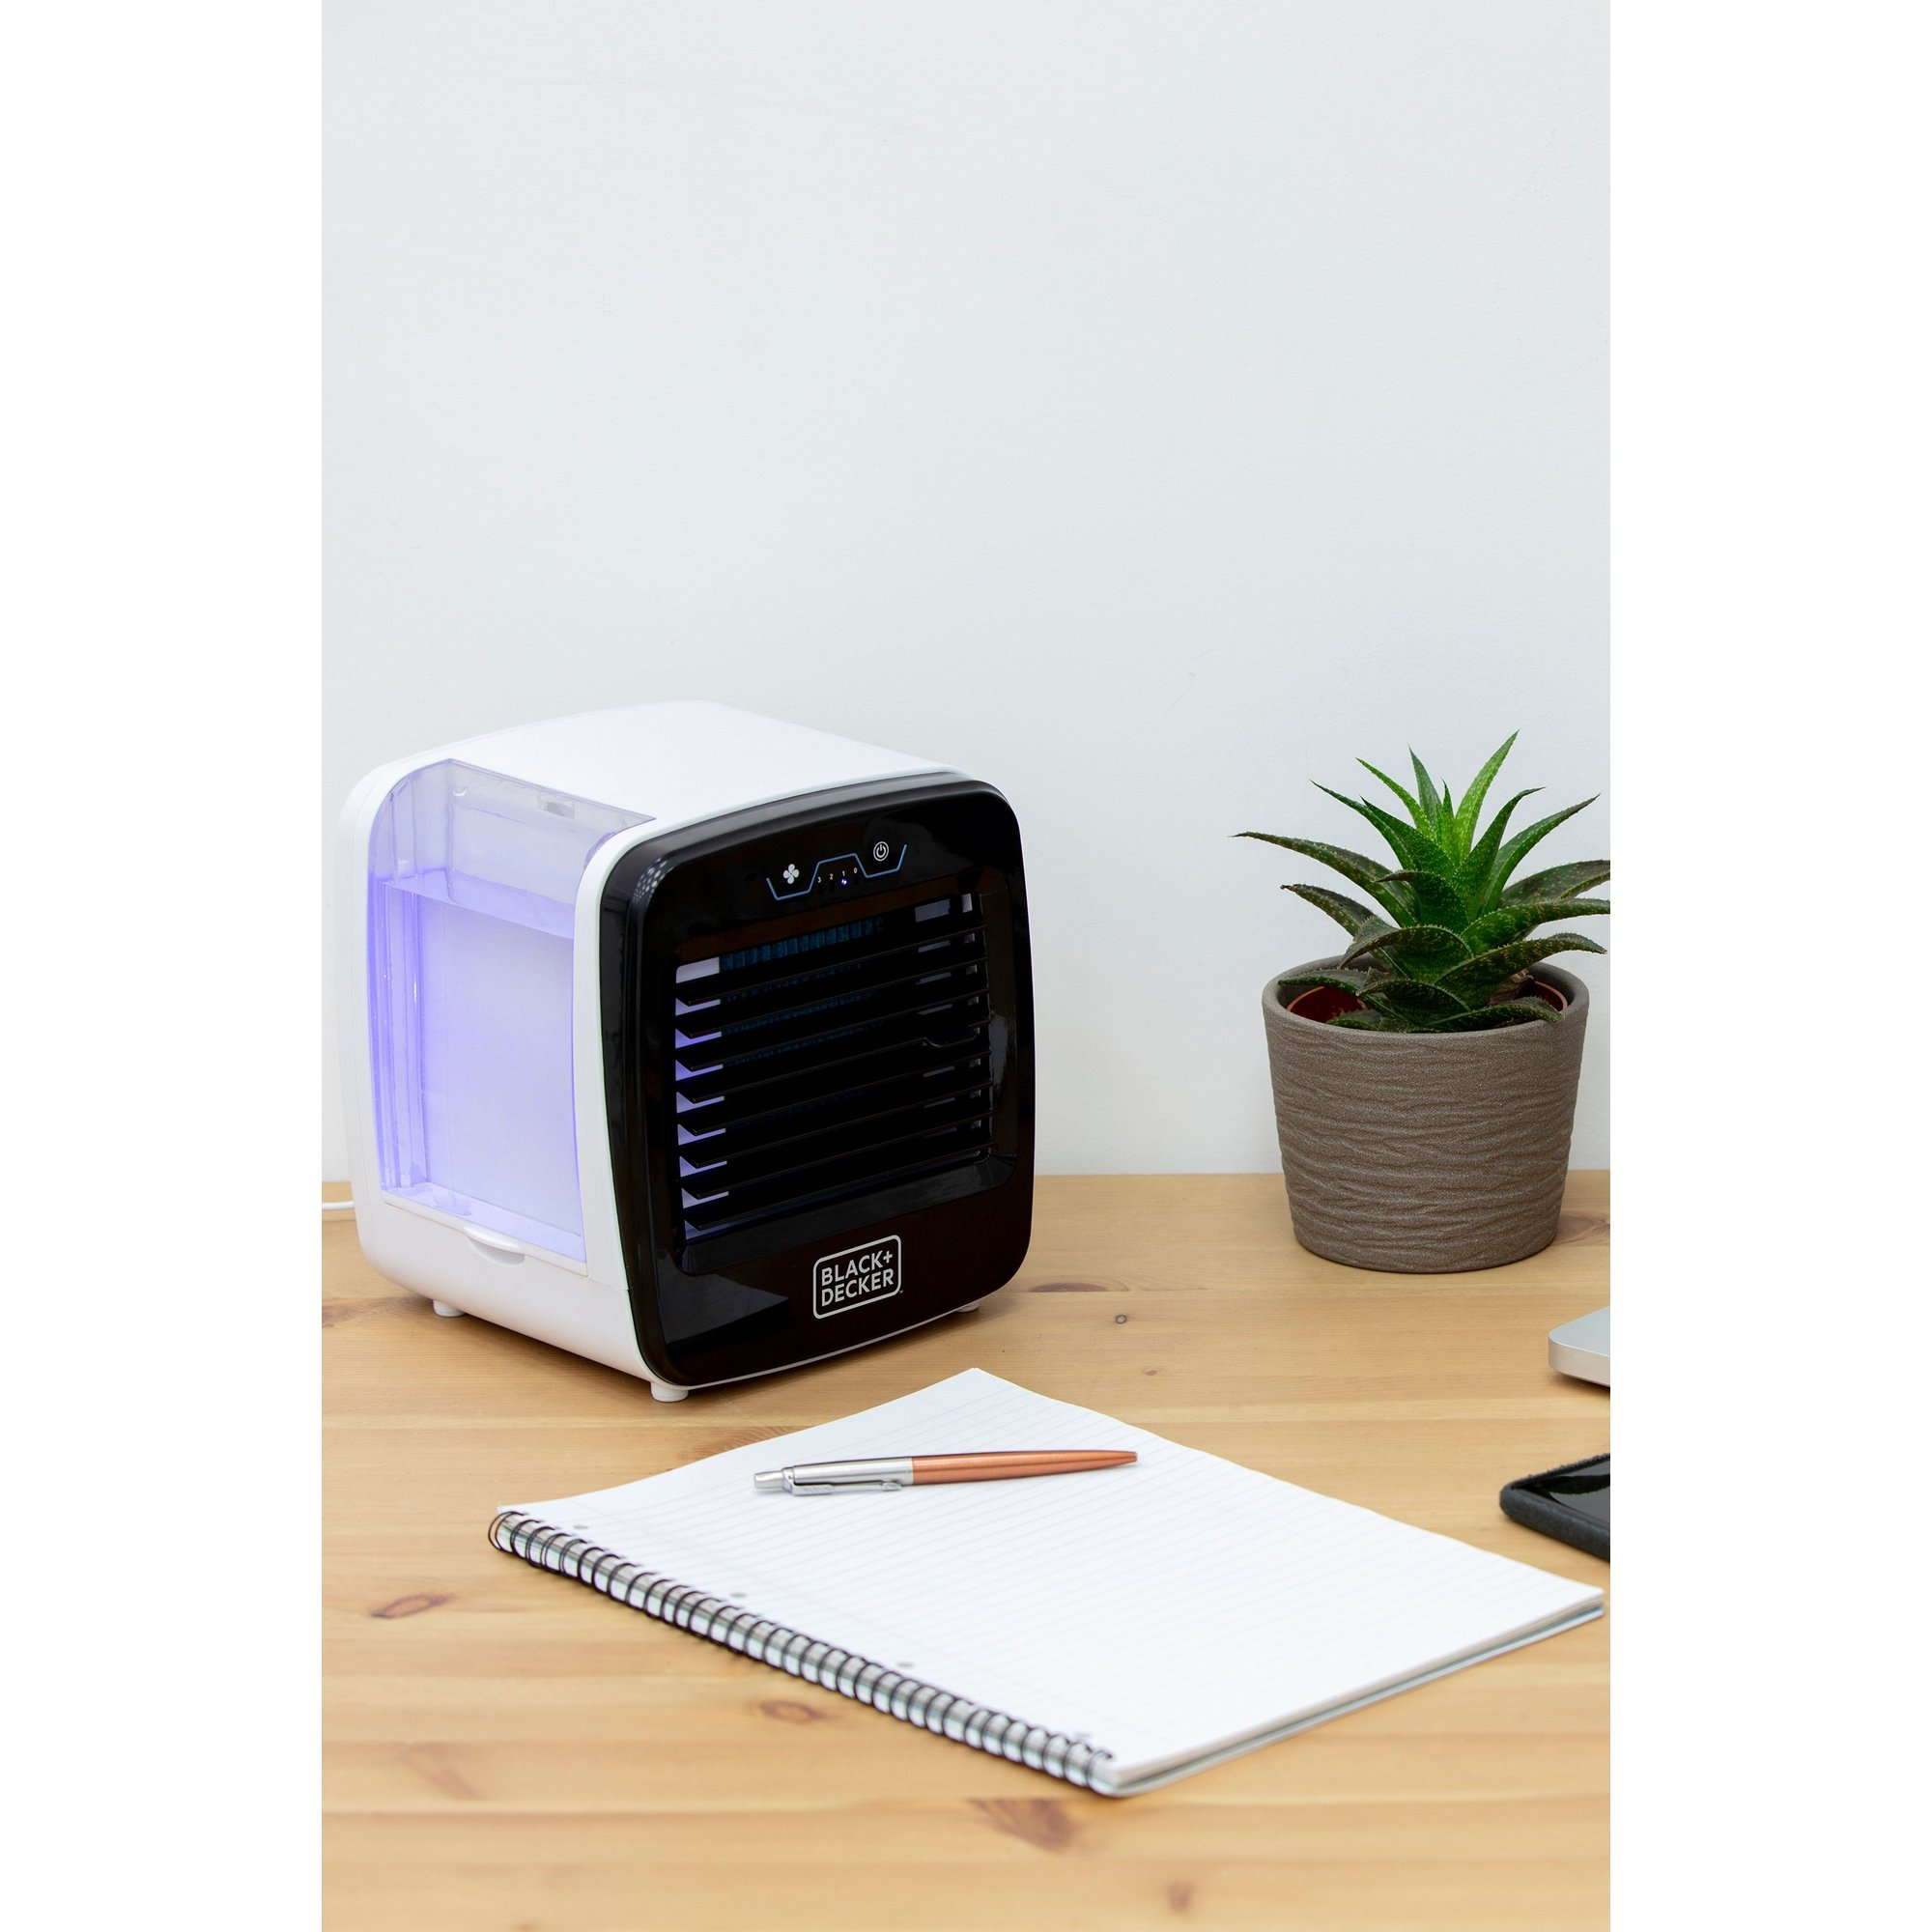 Image of Black and Decker Digital LED Mini Air Cooler